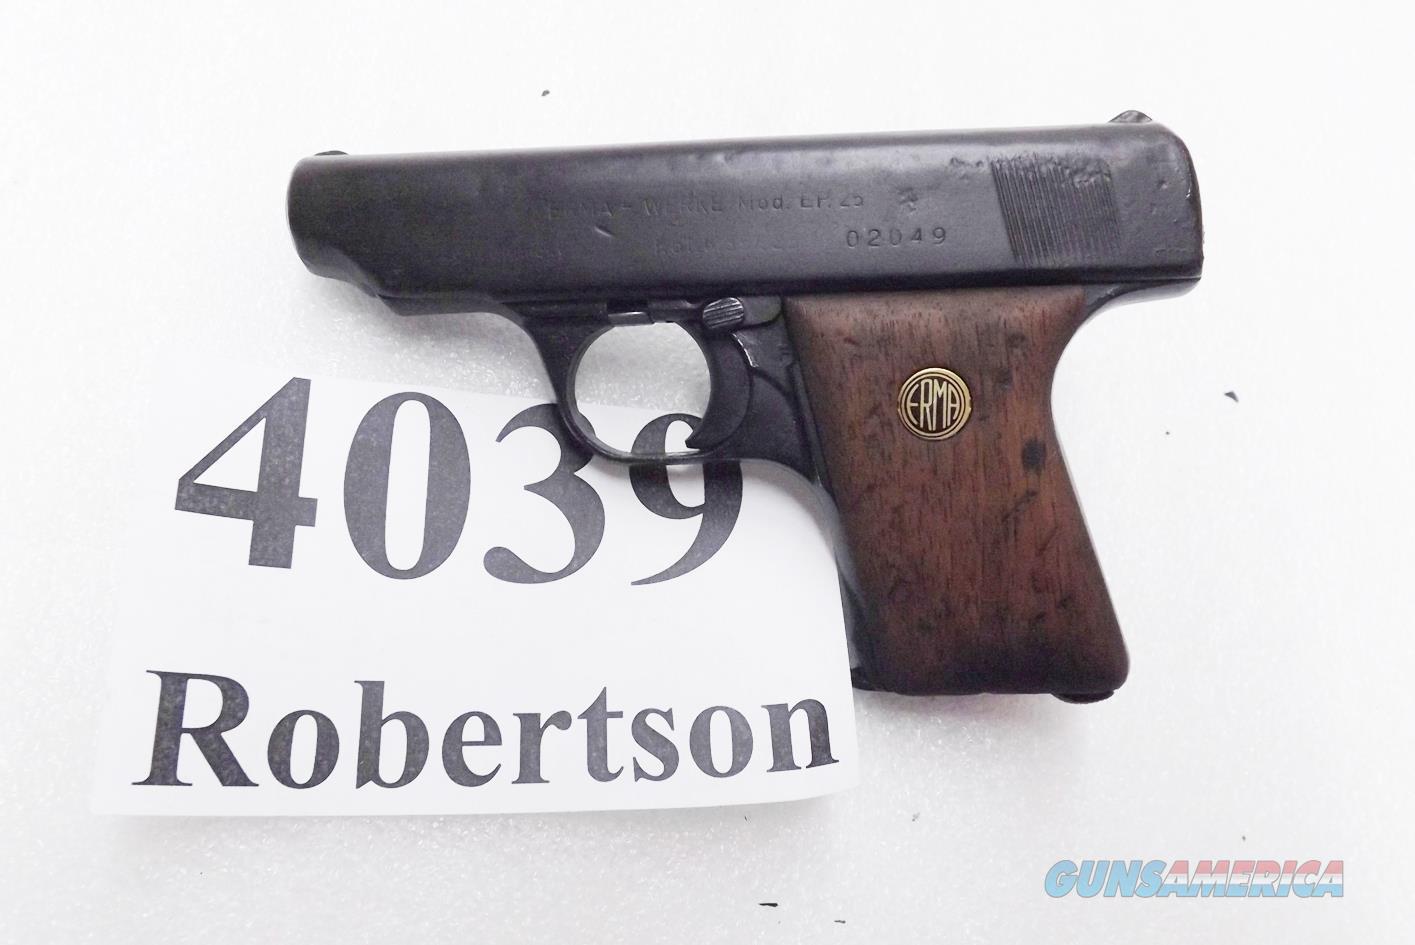 Erma .25 ACP model EP25 Copy of Eva Braun's Ortgies 25 Automatic 1967 Production  Guns > Pistols > Erma/Erma Werke